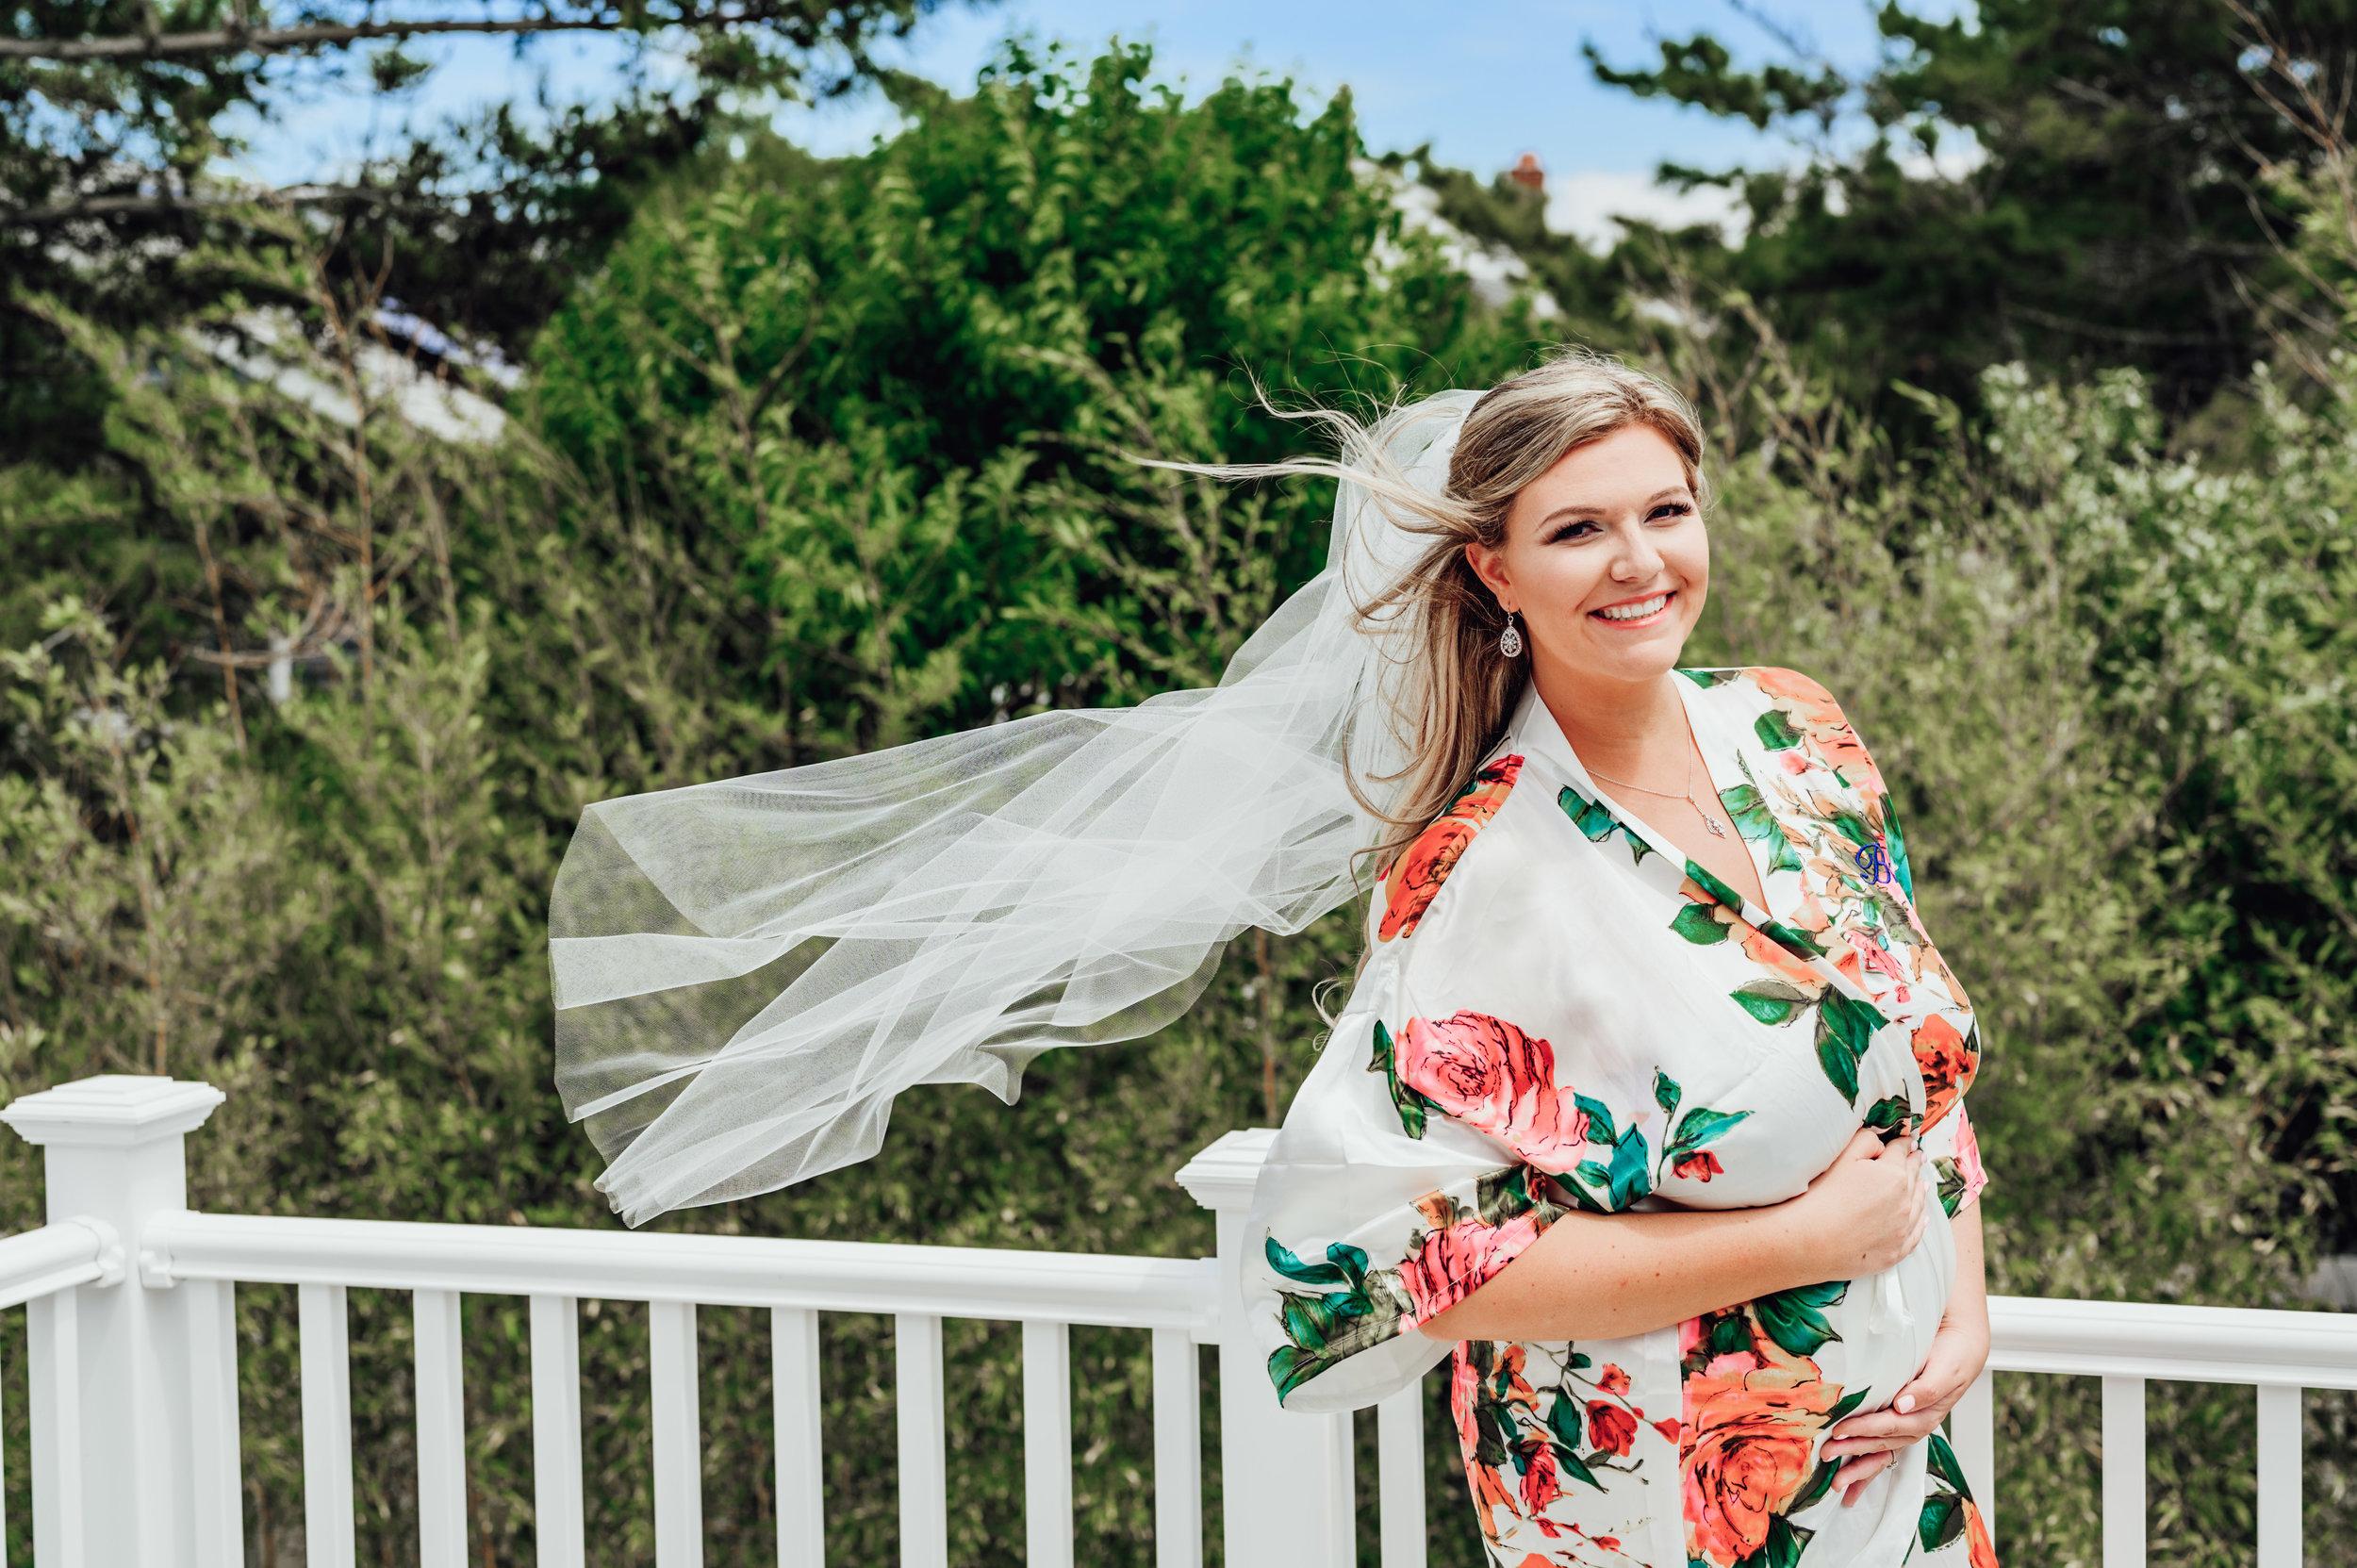 New Jersey Wedding Photographer, Felsberg Photography LBI wedding photography 26.jpg